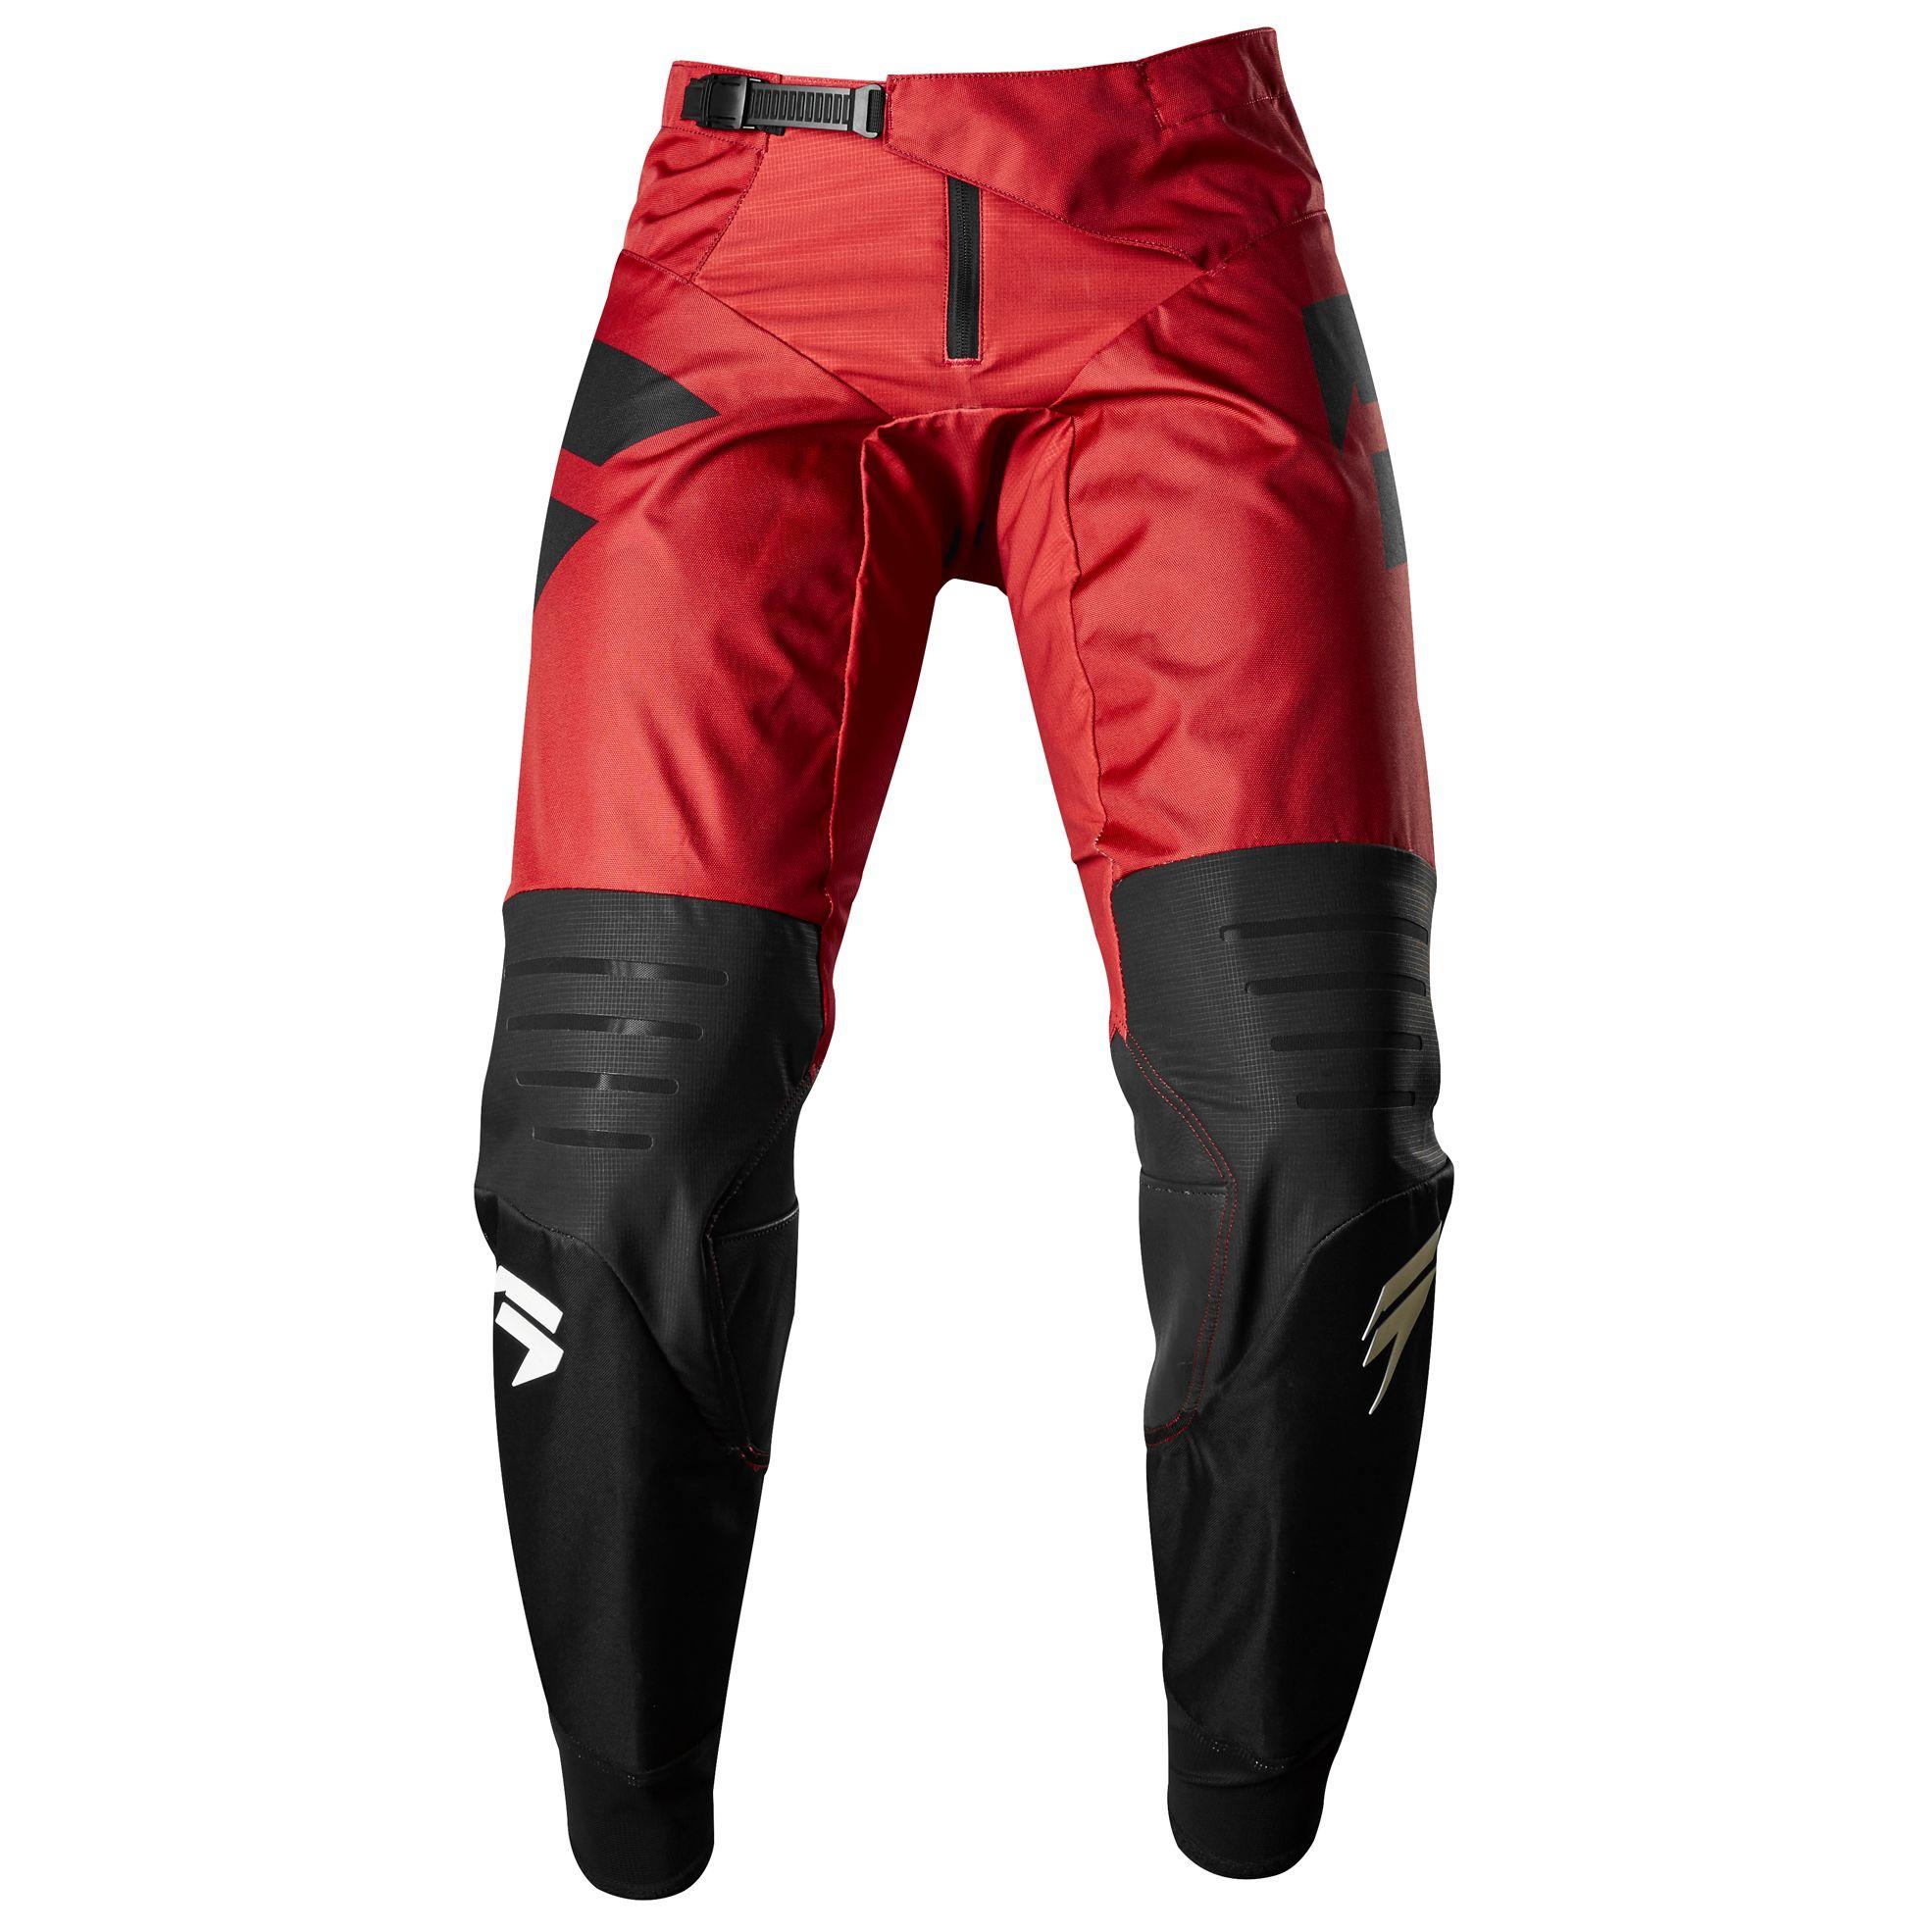 pantalon cross shift black strike rouge fonce 2018 tenue cross. Black Bedroom Furniture Sets. Home Design Ideas